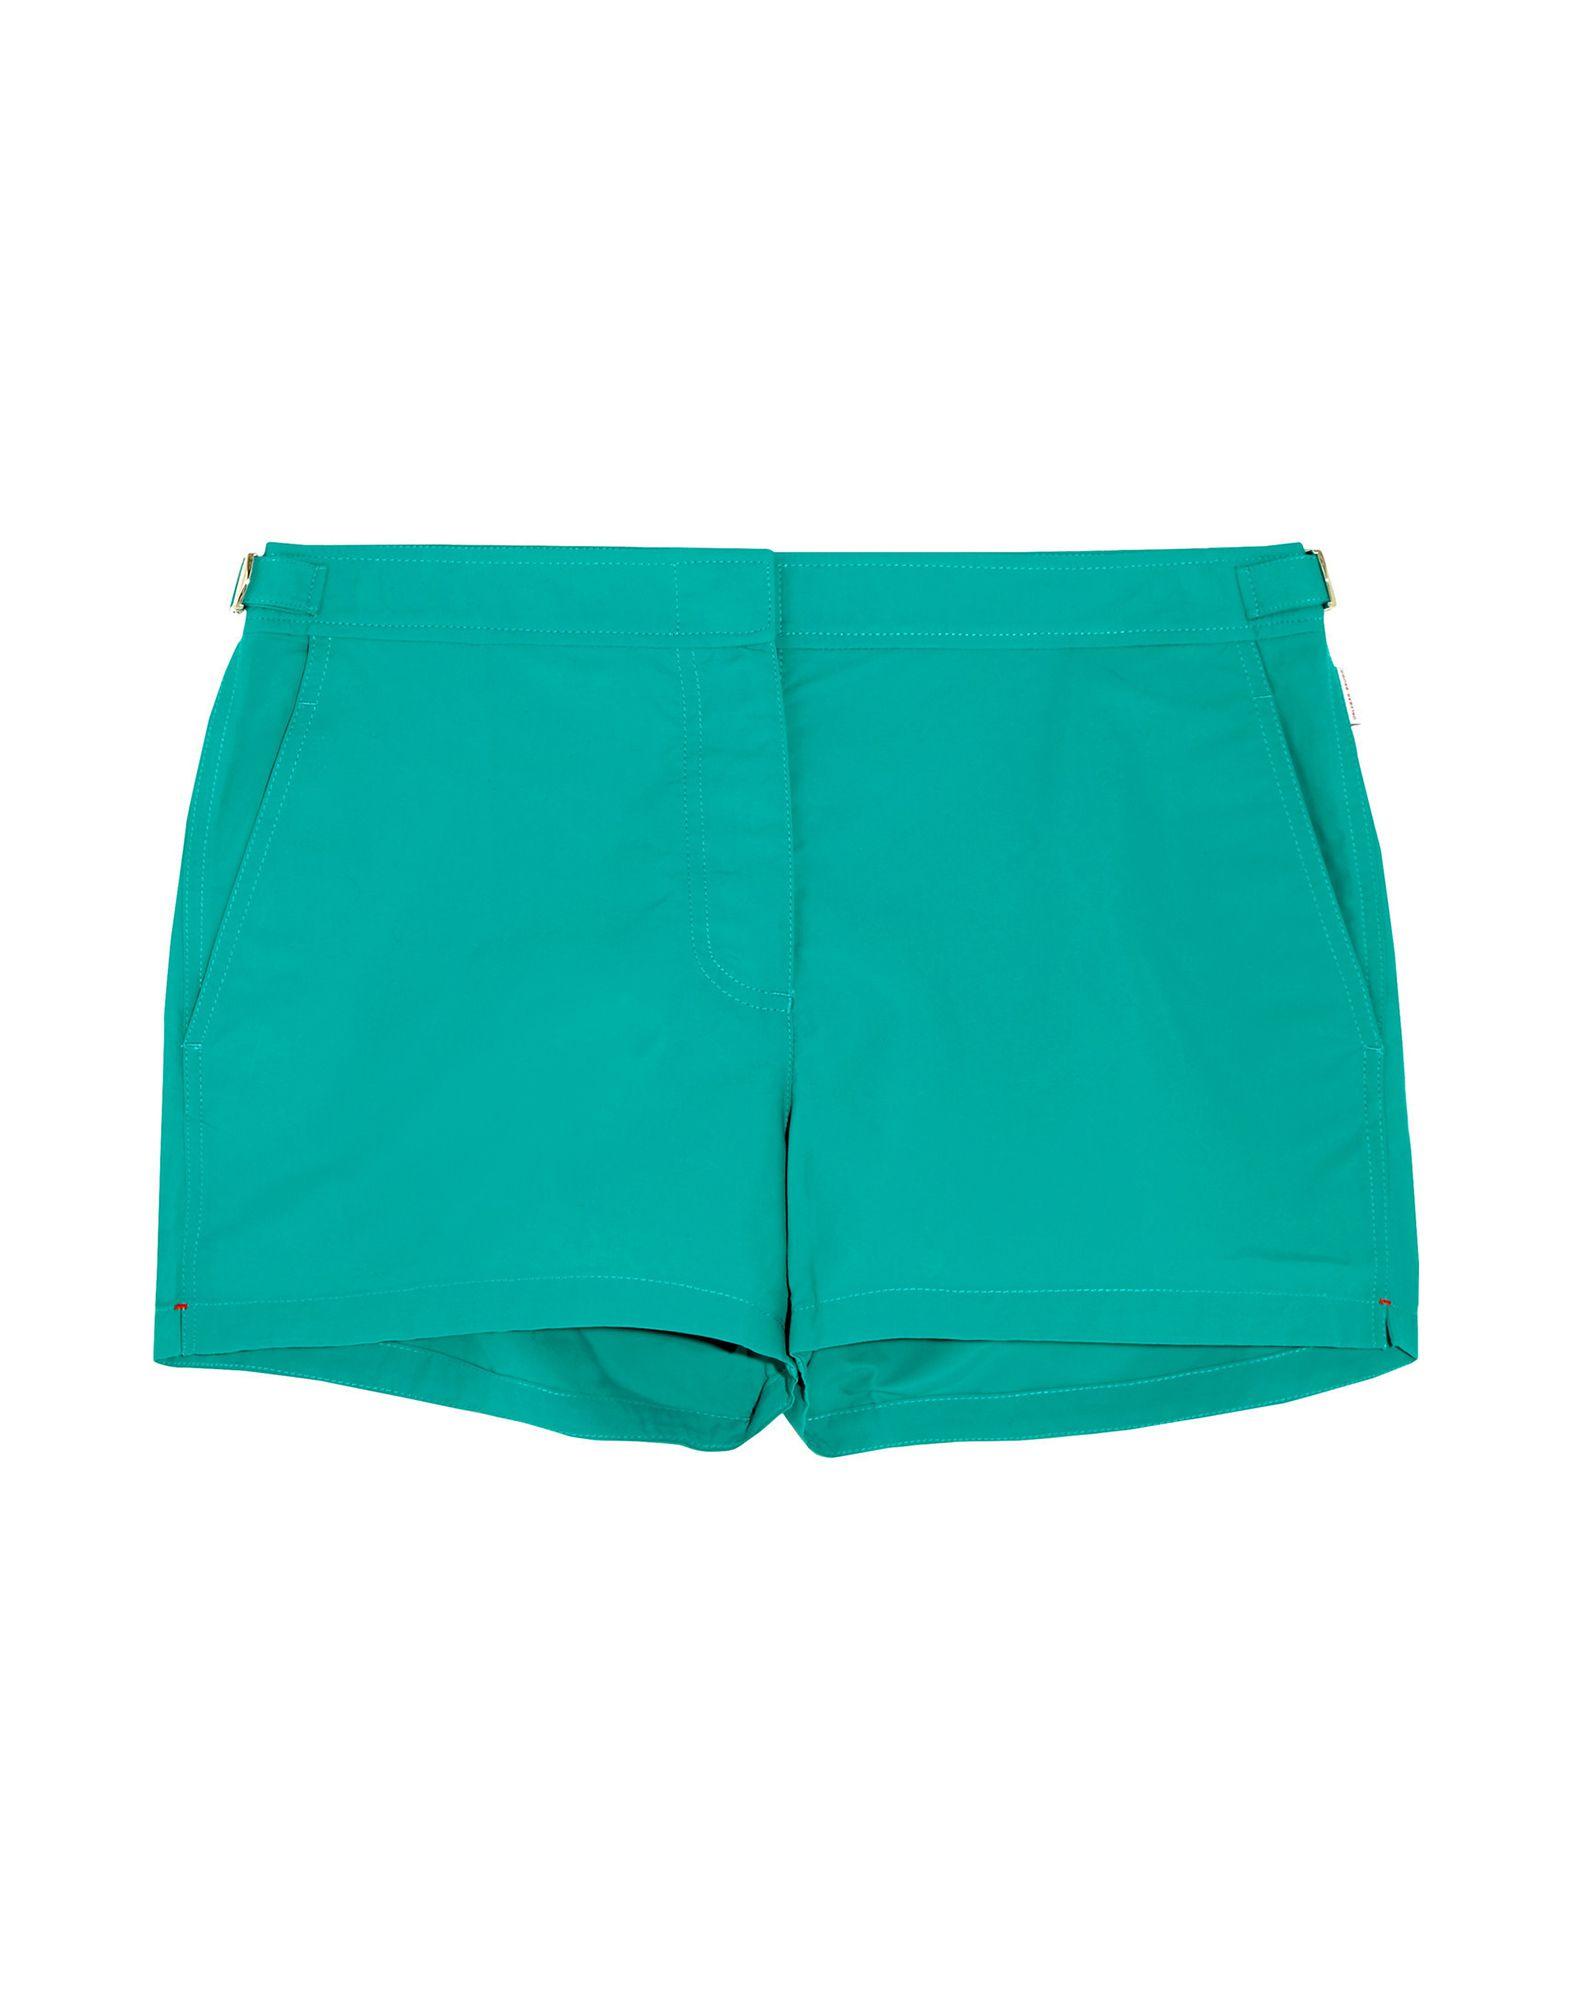 ORLEBAR BROWN Пляжные брюки и шорты arena пляжные брюки и шорты